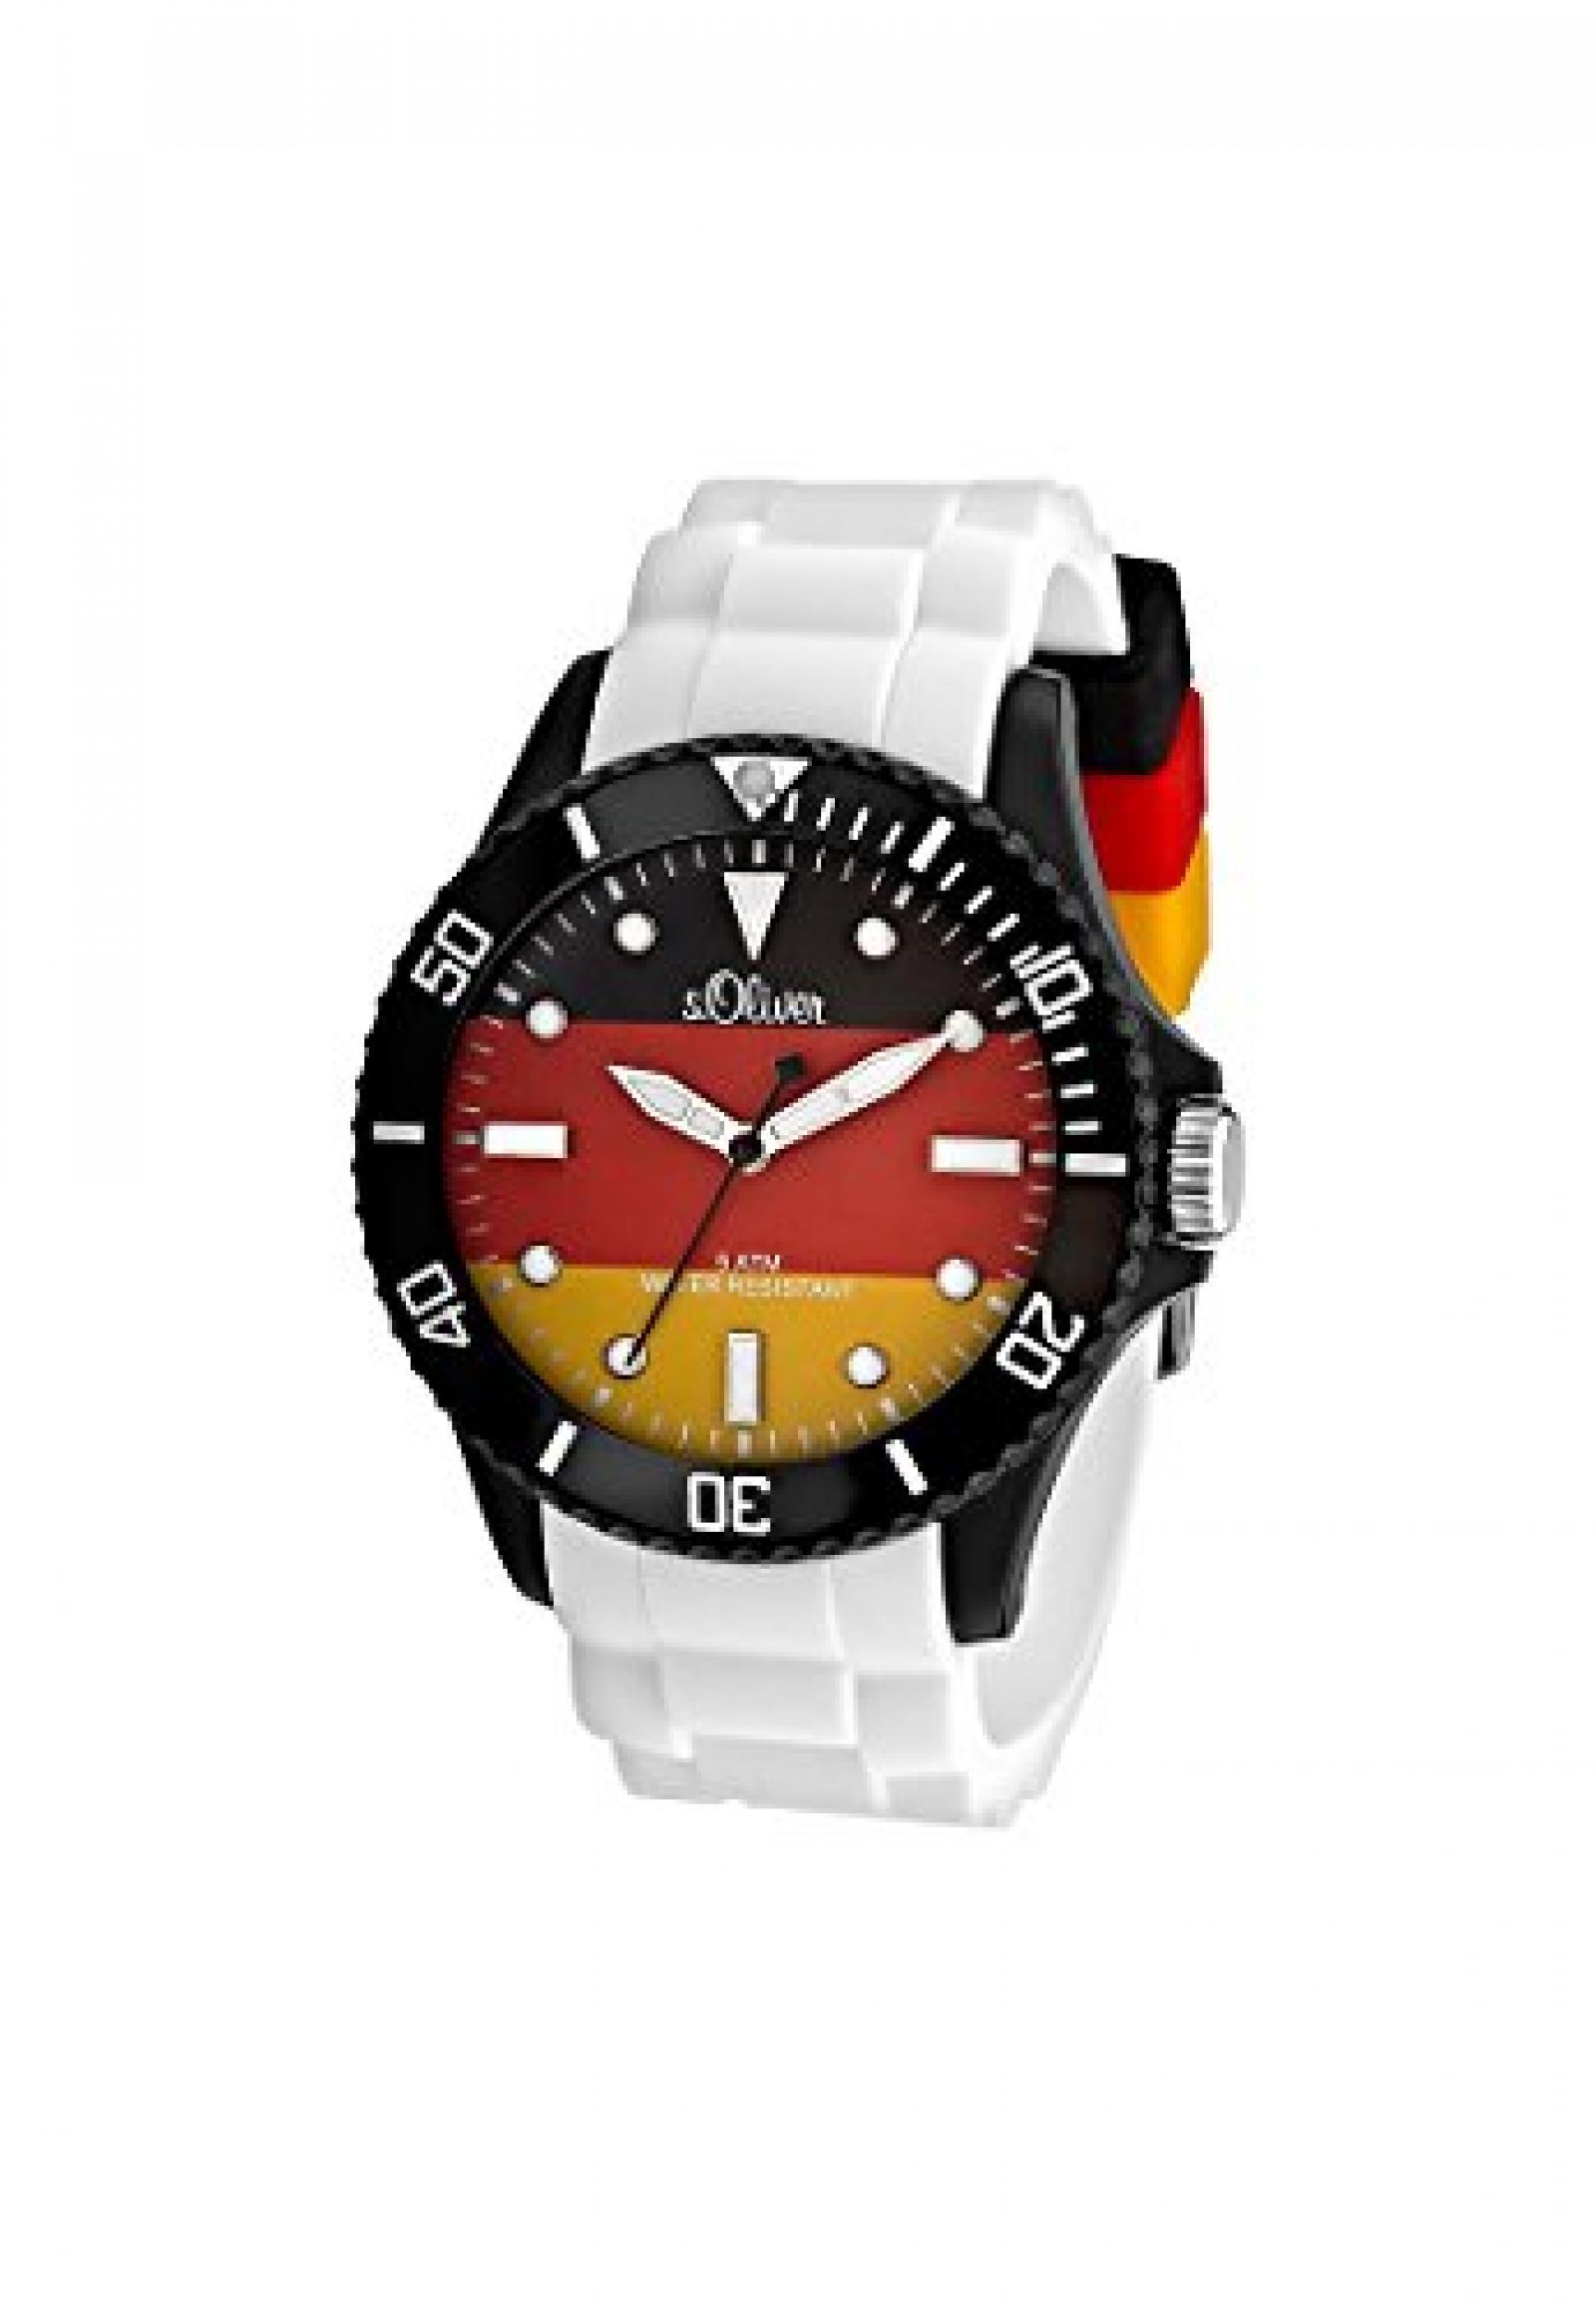 S.Oliver Herren-Armbanduhr Analog Quarz (One Size, schwarz/rot/gold)